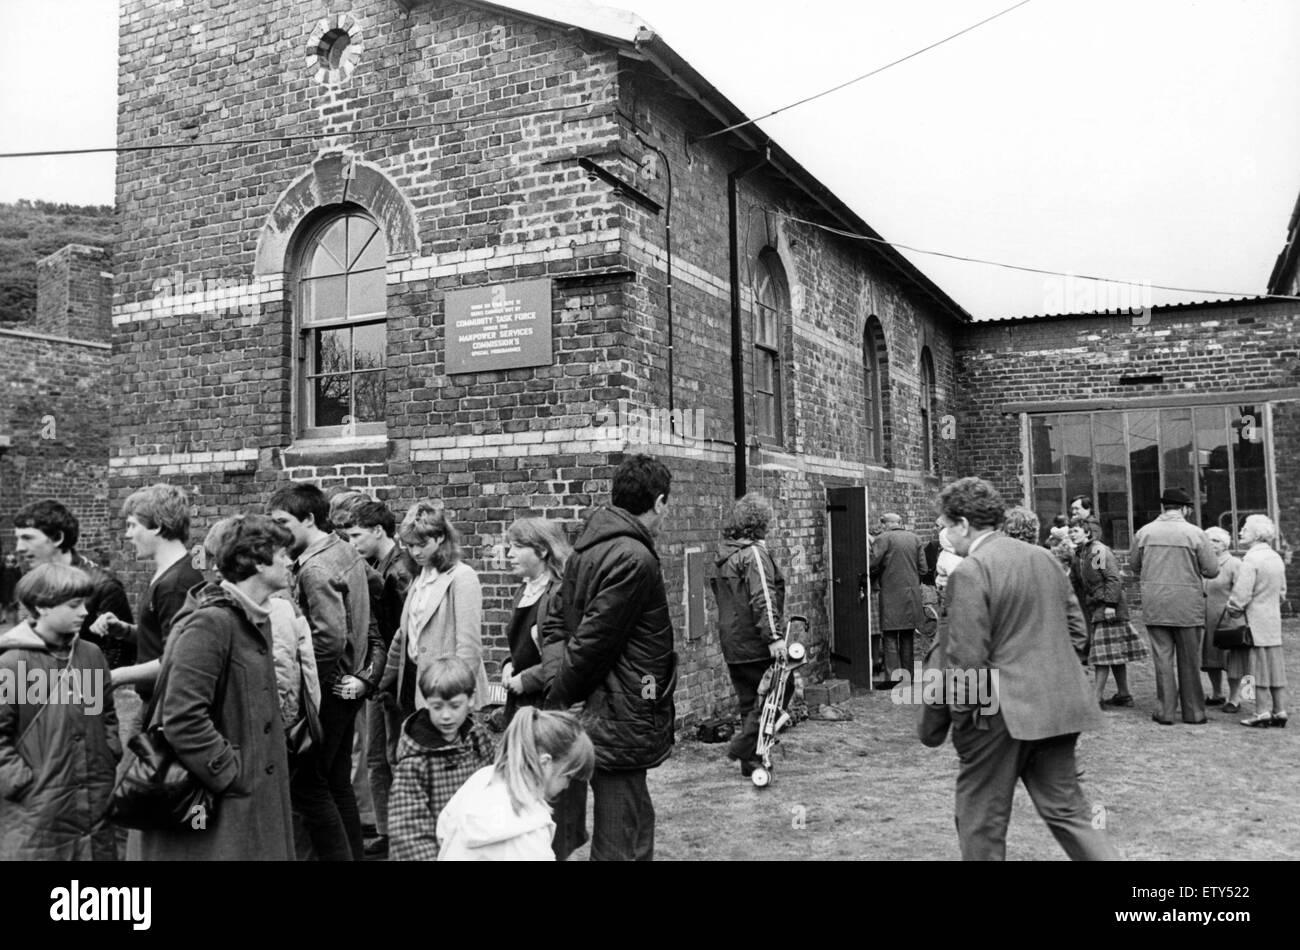 The Tom Leonard Mining Museum. 30th May 1983. - Stock Image